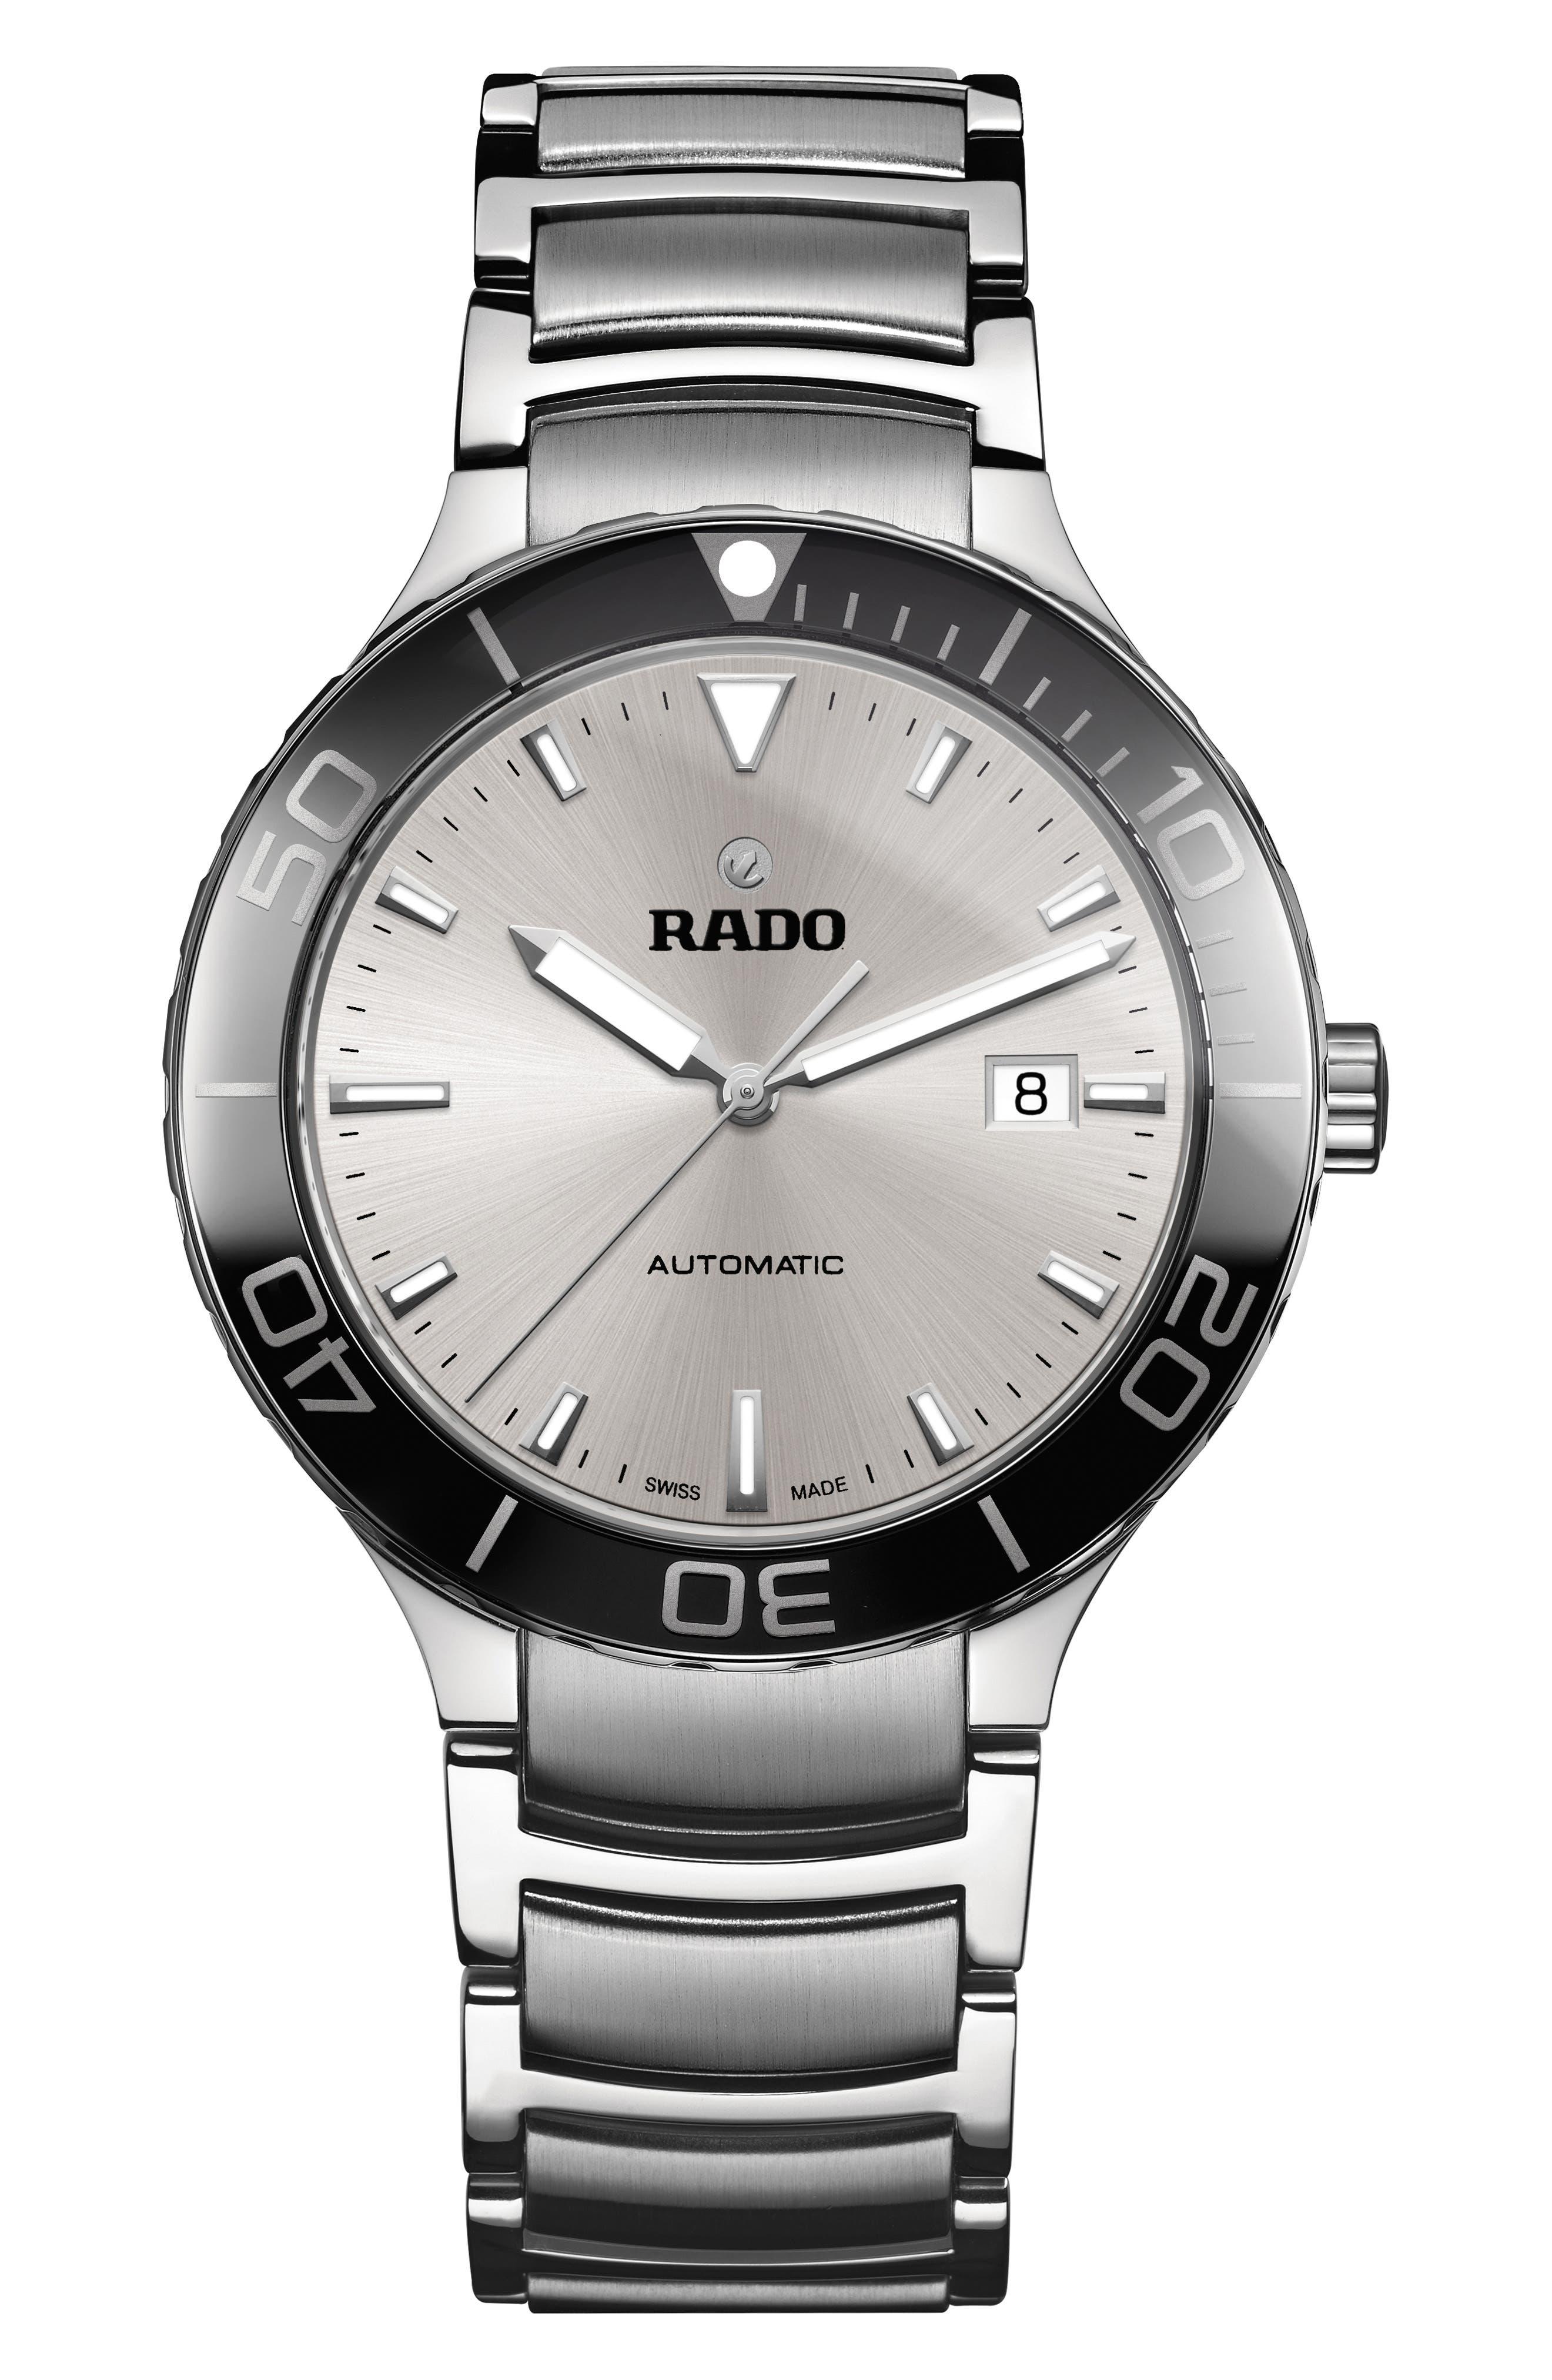 RADO Centrix Automatic Bracelet Watch, 42Mm in Silver/ Black